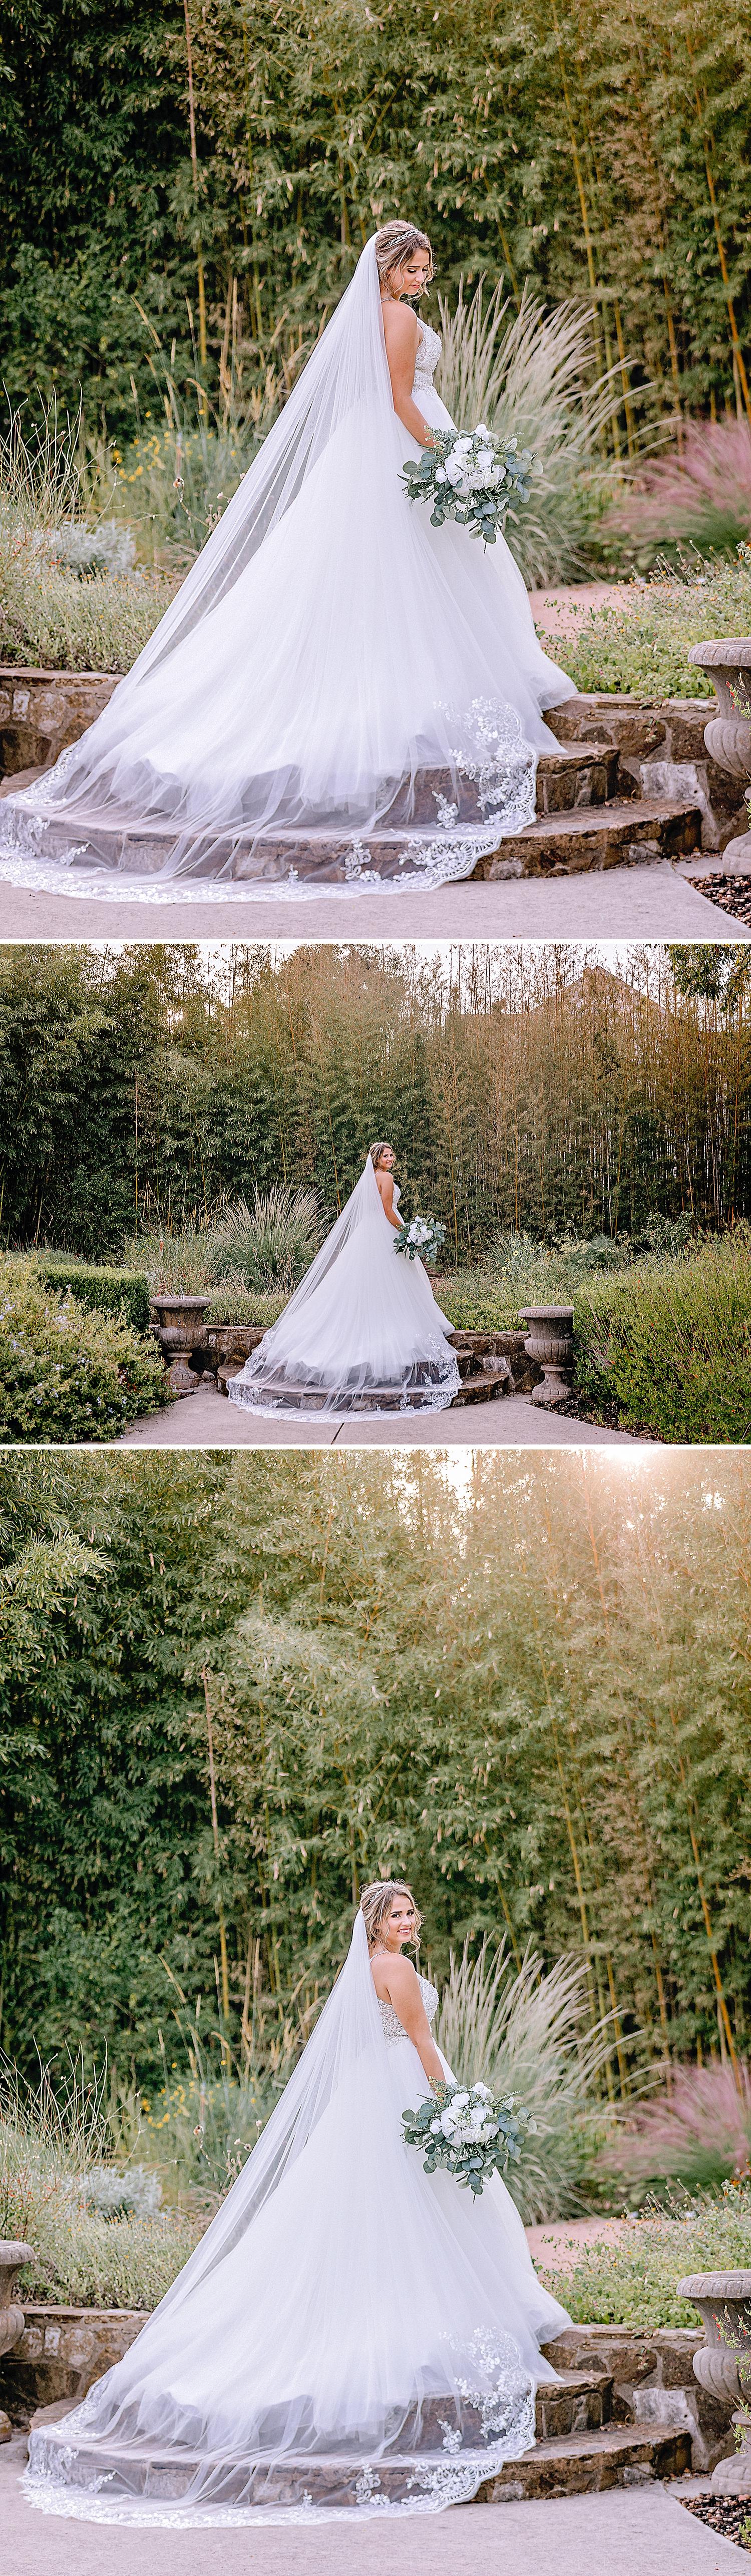 San-Antonio-Weddings-Bridal-Photos-Carly-Barton-Photography_0010.jpg